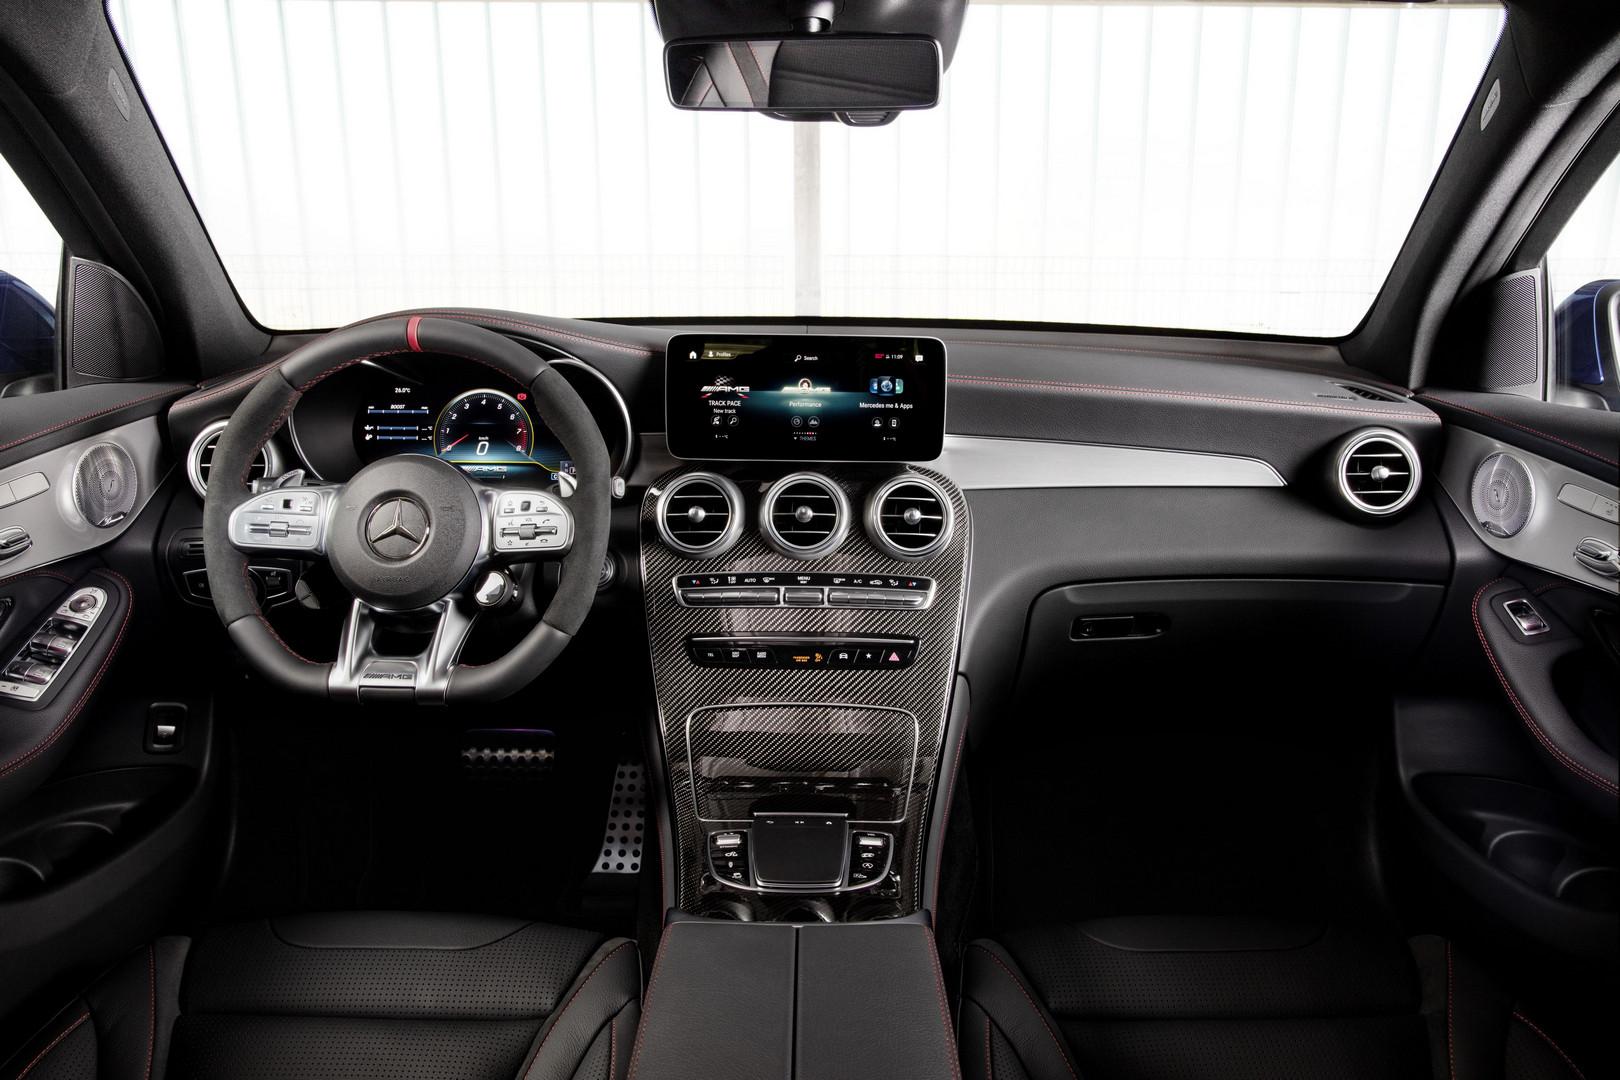 Mercedes-AMG GLC 43 SUV Interior